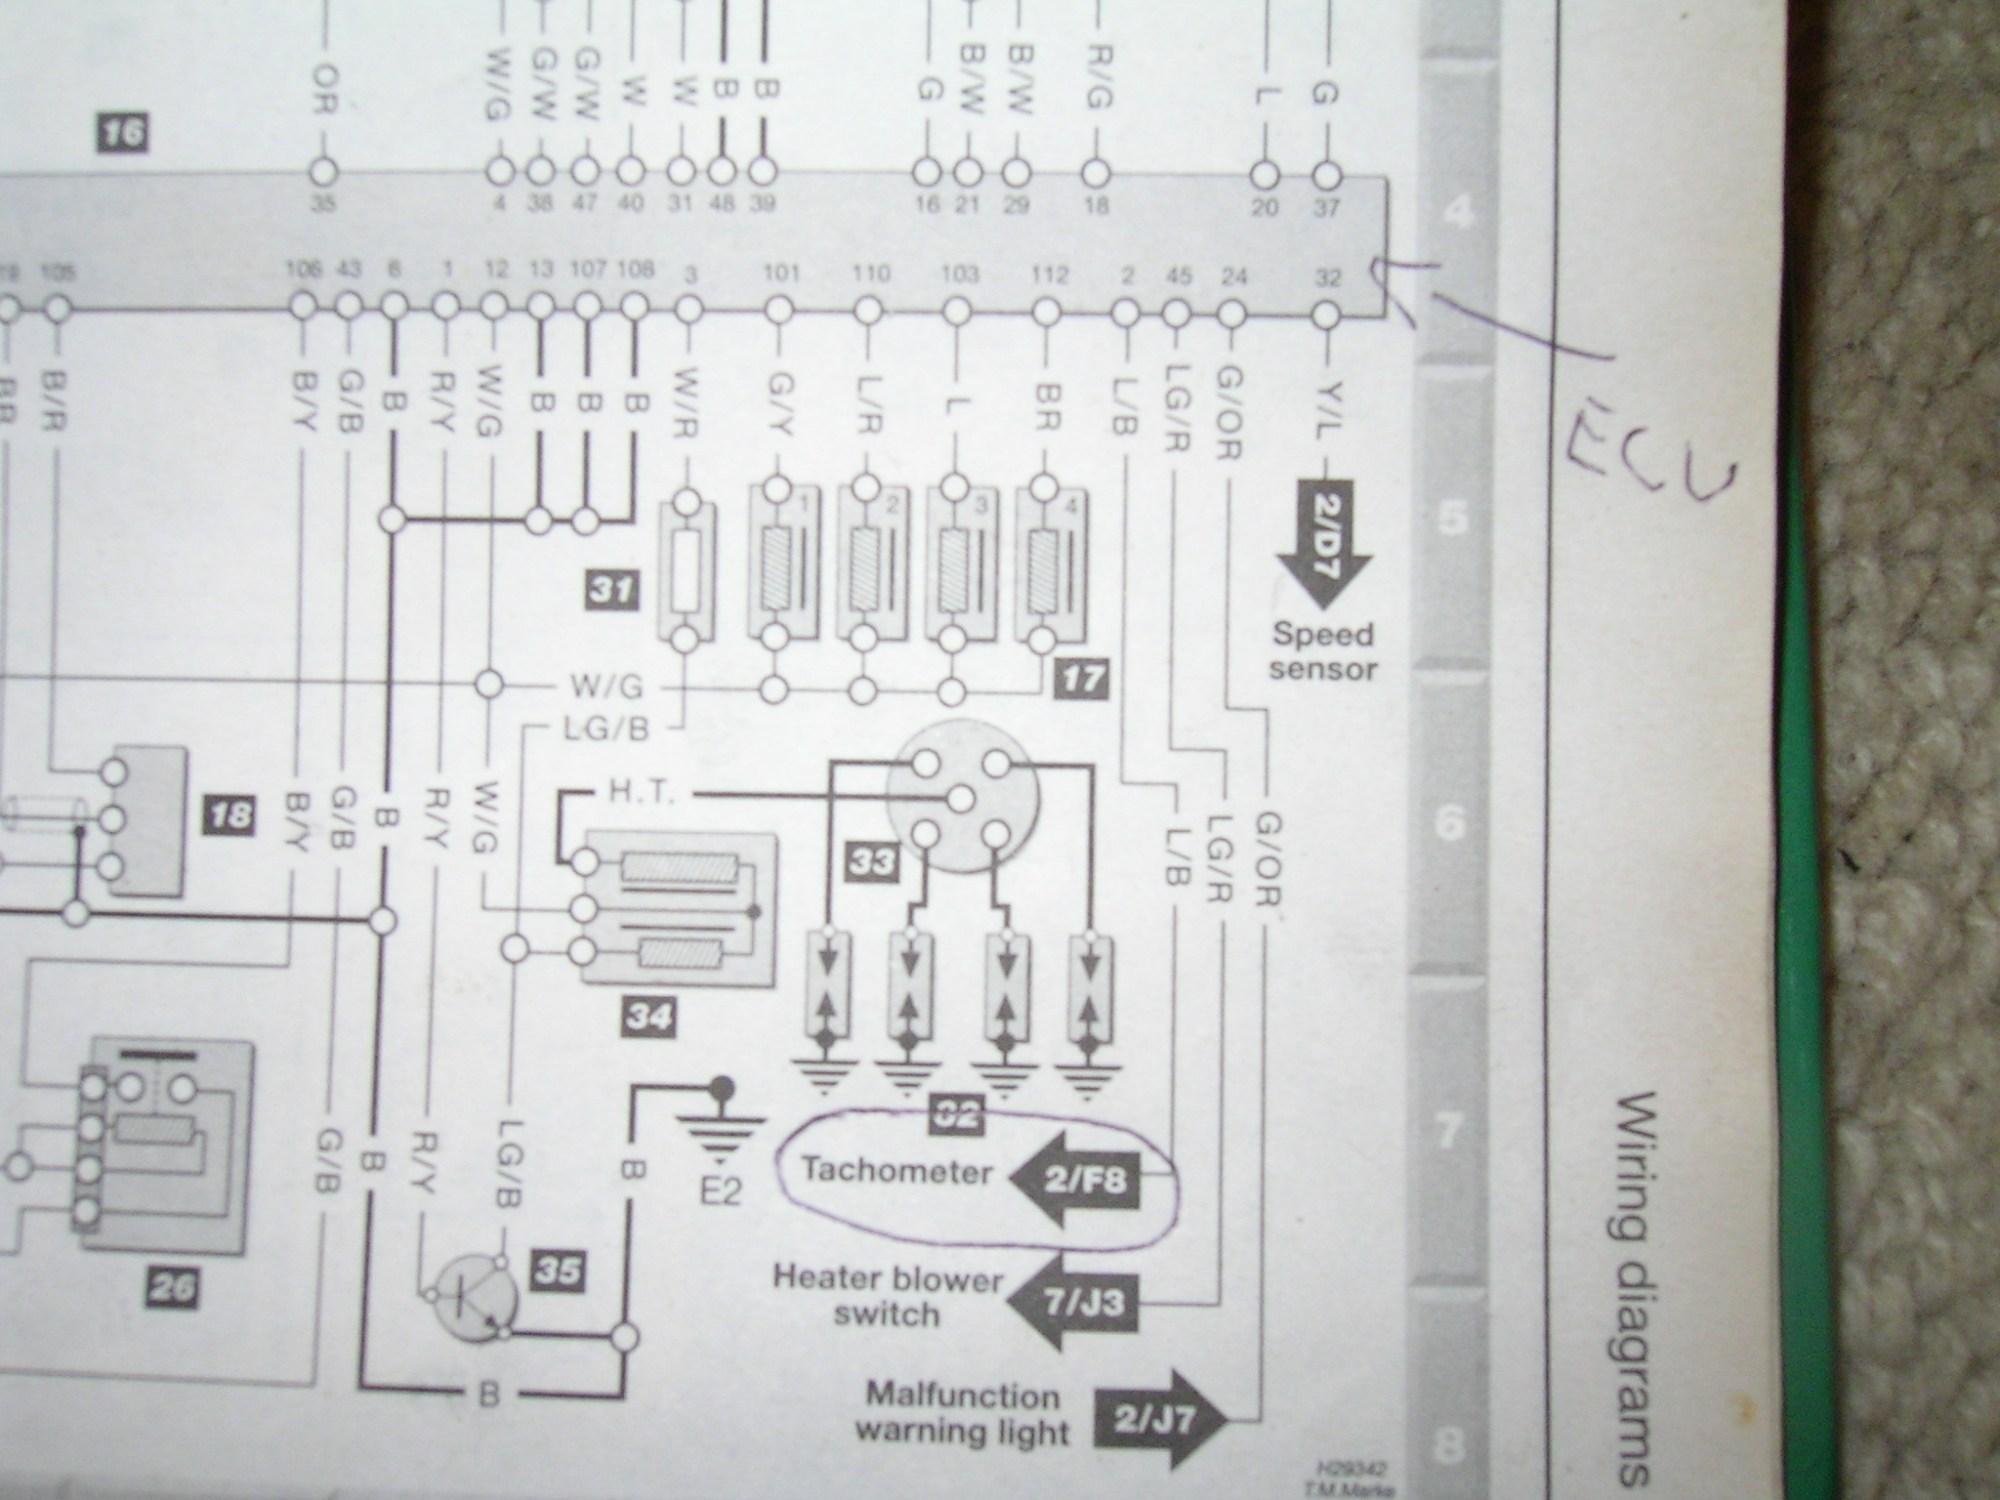 hight resolution of nissan micra k11 ecu wiring diagram 35 wiring diagram nissan micra electrical diagram nissan micra electrical diagram